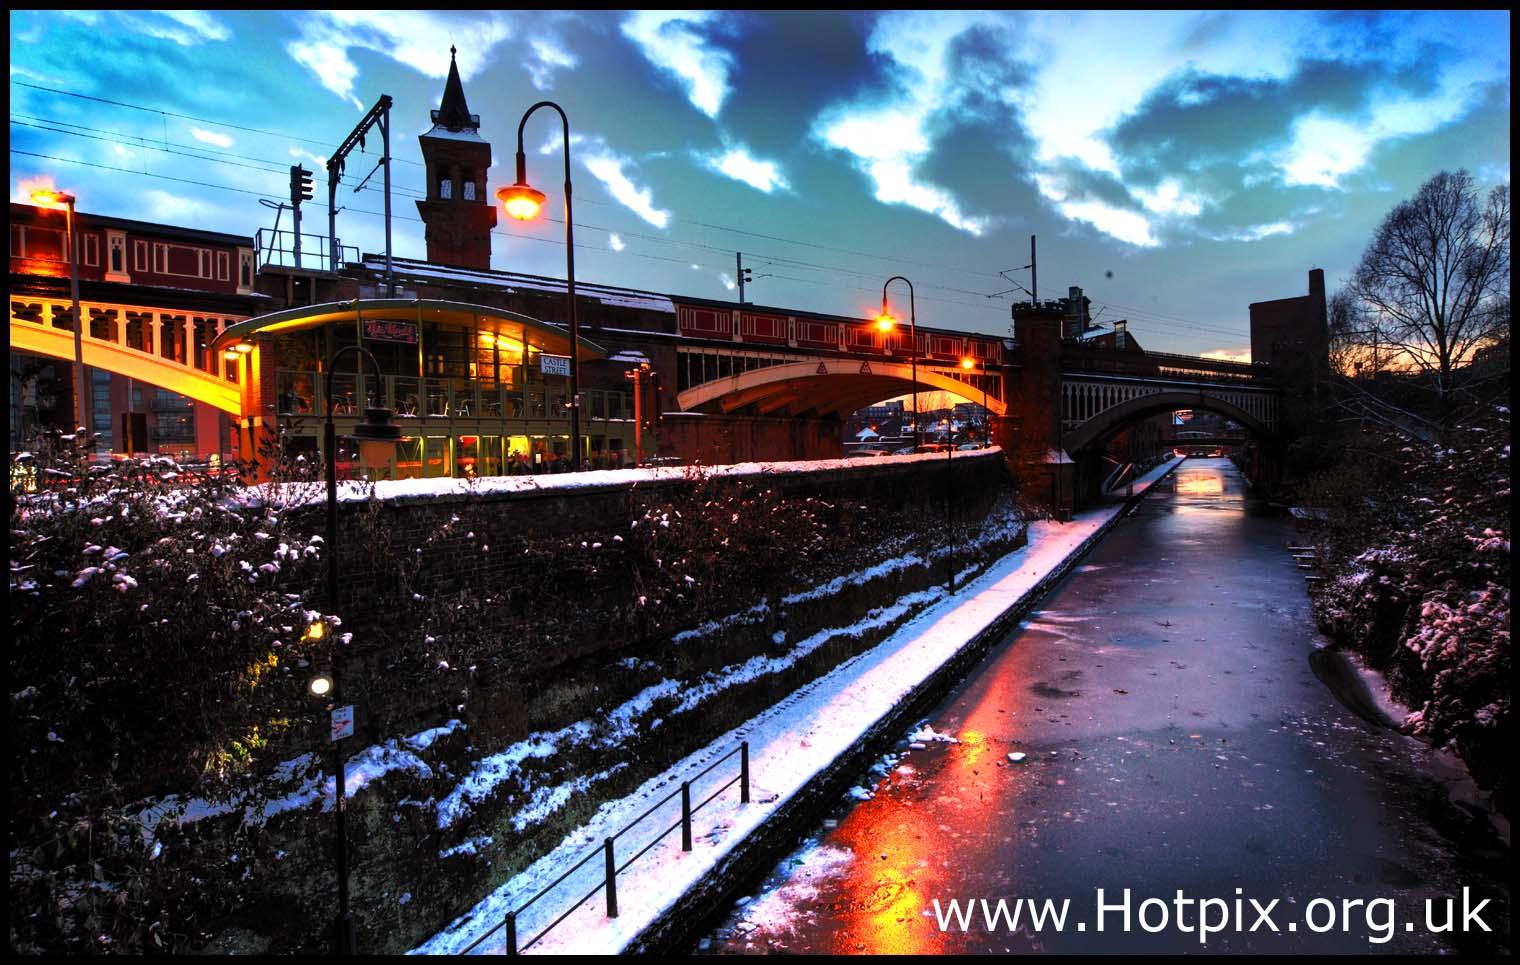 manchester,deans,gate,deansgate,A56,road,station,railway,castlefield,knott,bar,knottmill,mill,tony,smith,hotpix,tonysmith,tonysmithhotpix,dusk,magic,blue,hour,ice,snow,canal,winter,dukes,92,dukes92,reflection,reflections,night,street,light,lighting,england,UK,GB,north,west,northwest,europe